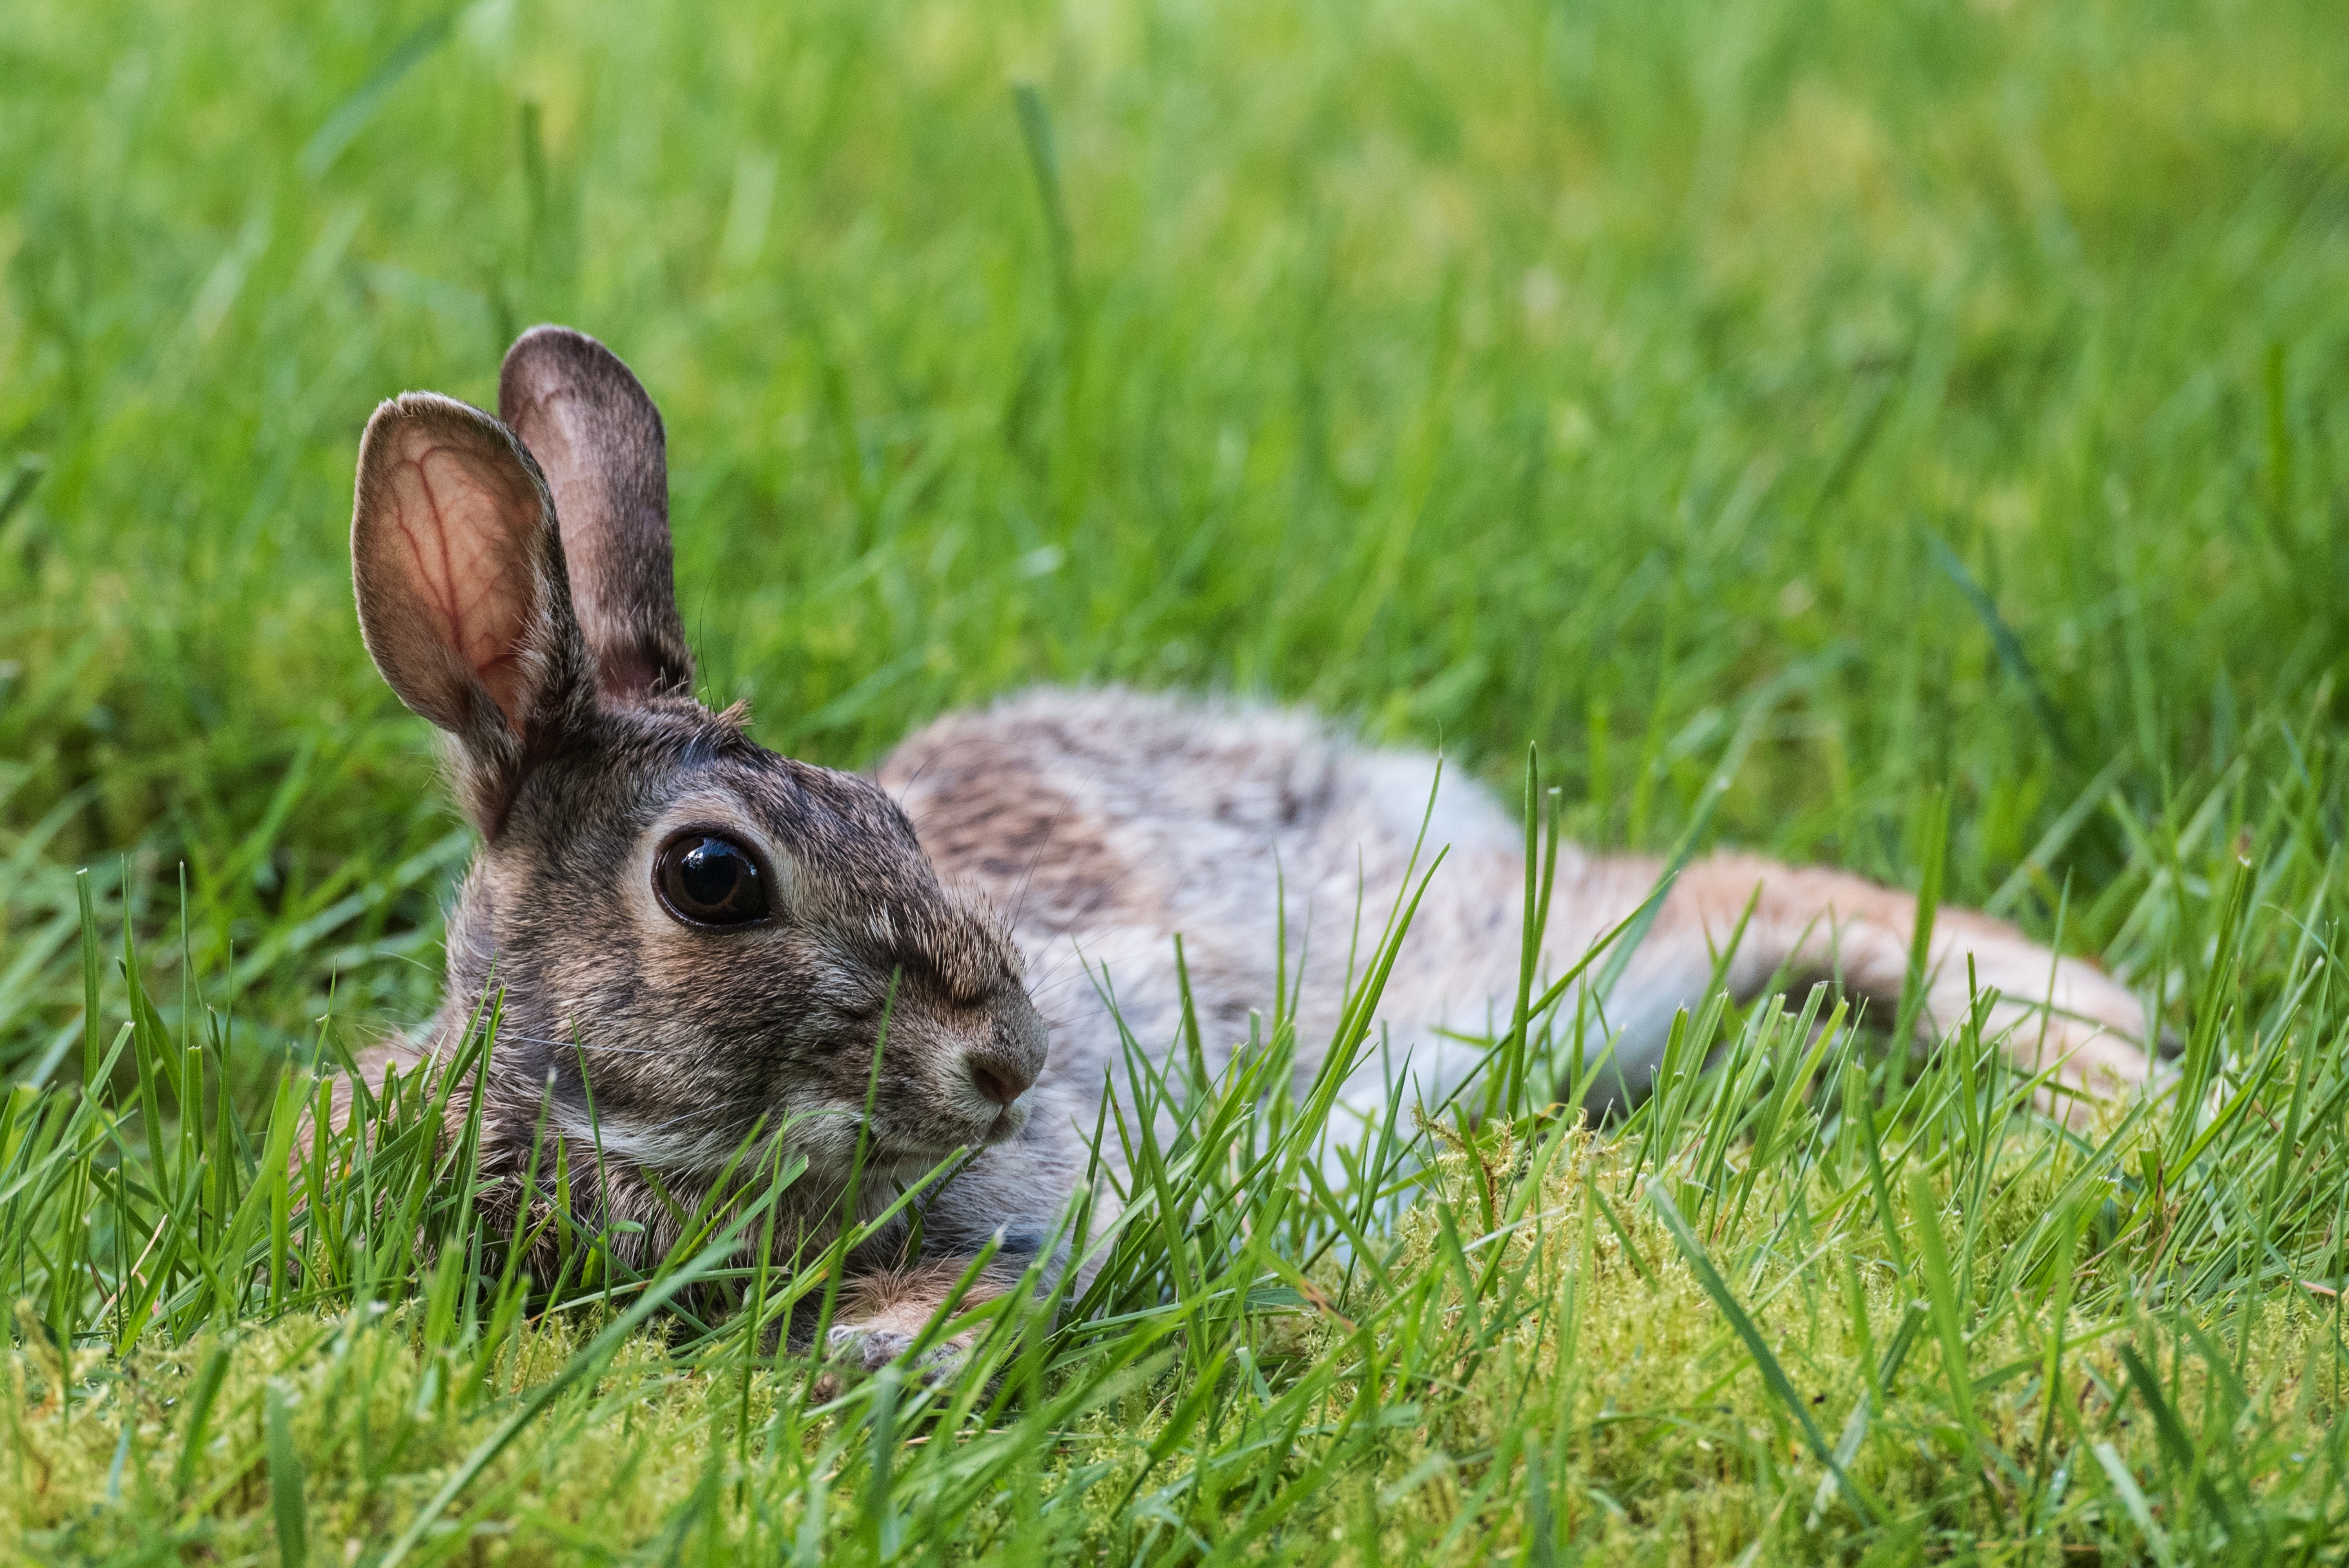 природа животные заяц nature animals hare  № 103308 загрузить